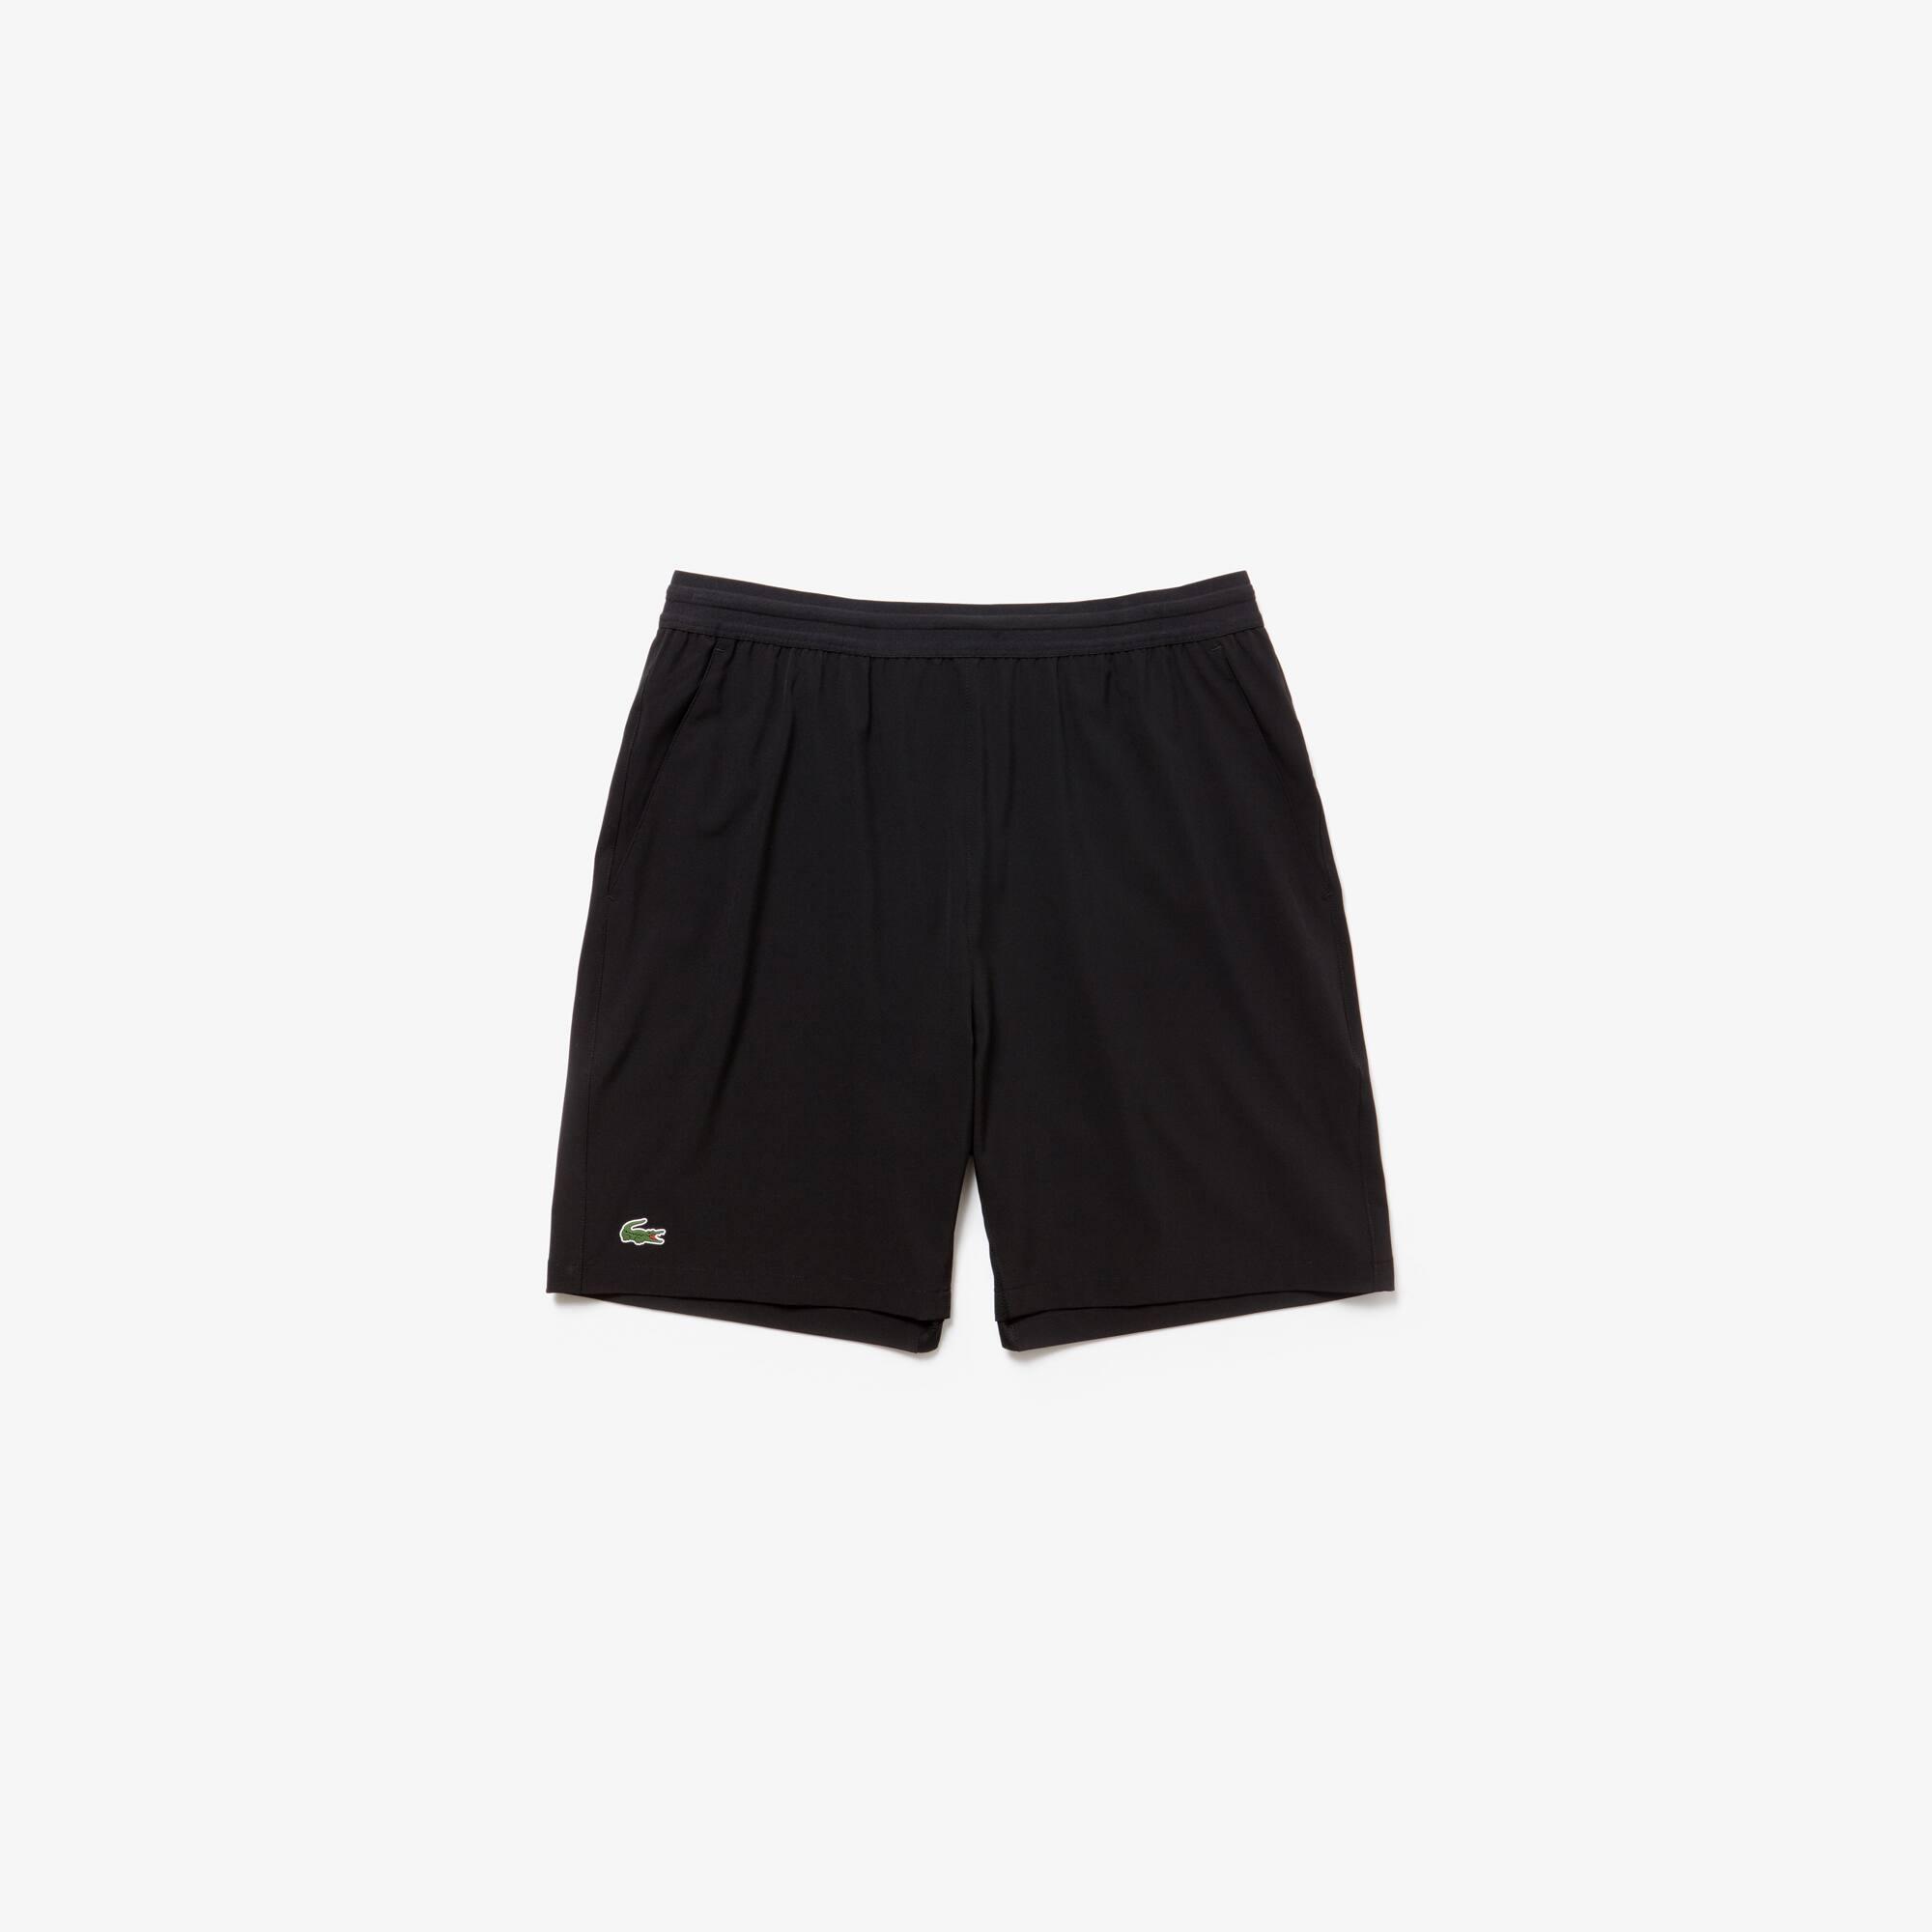 Short Lacoste SPORT Tennis Masculino Stretch Estampado